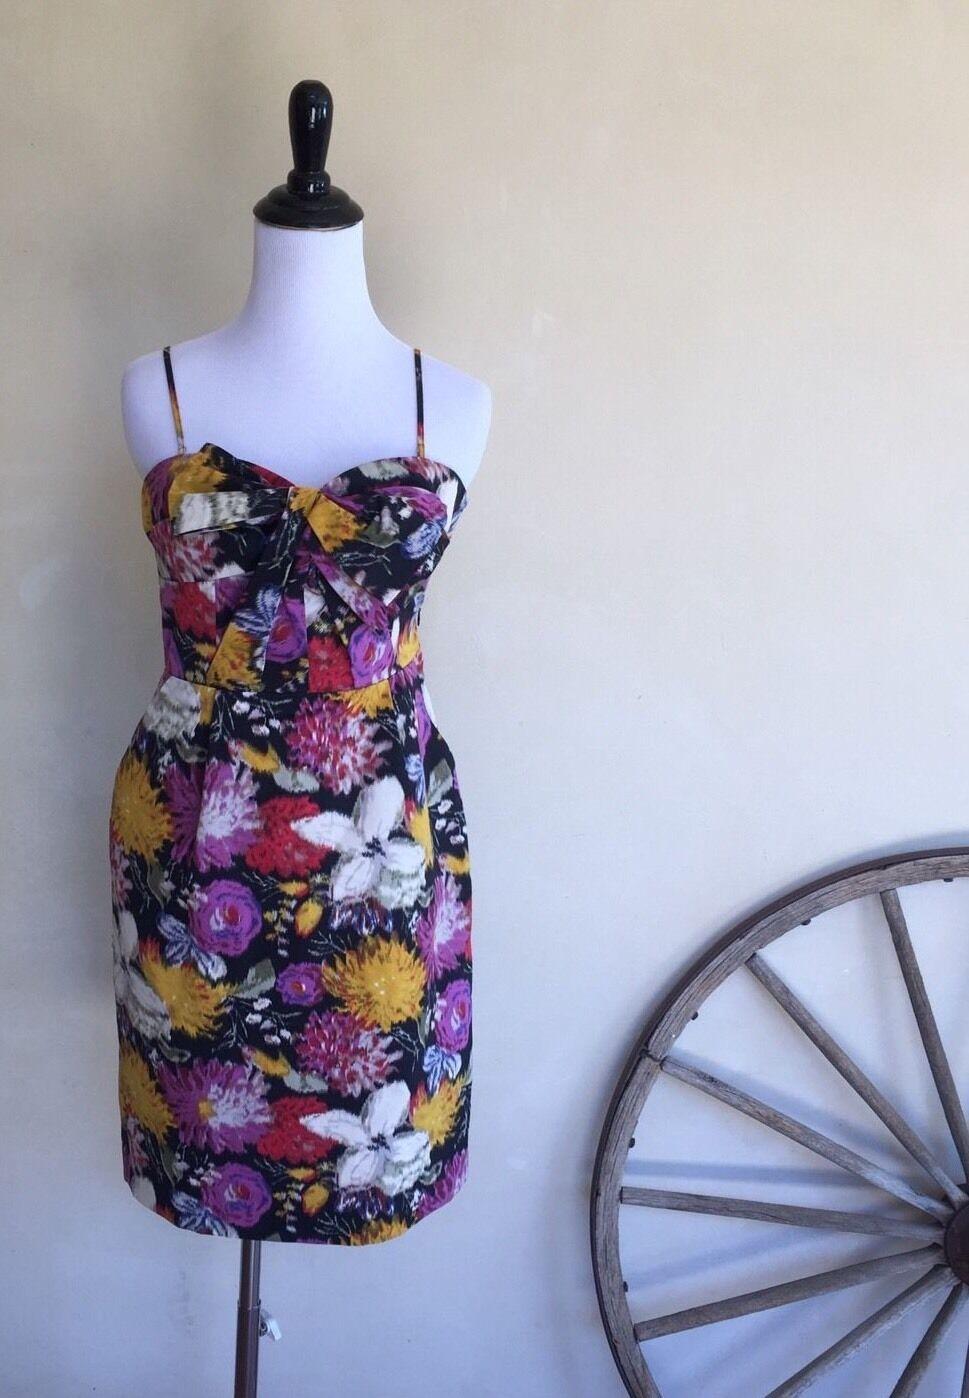 MOULINETTE SOEURS Woherren Strapless Dress Multi Farbe 0 Bow 100%cotton Bow Tie